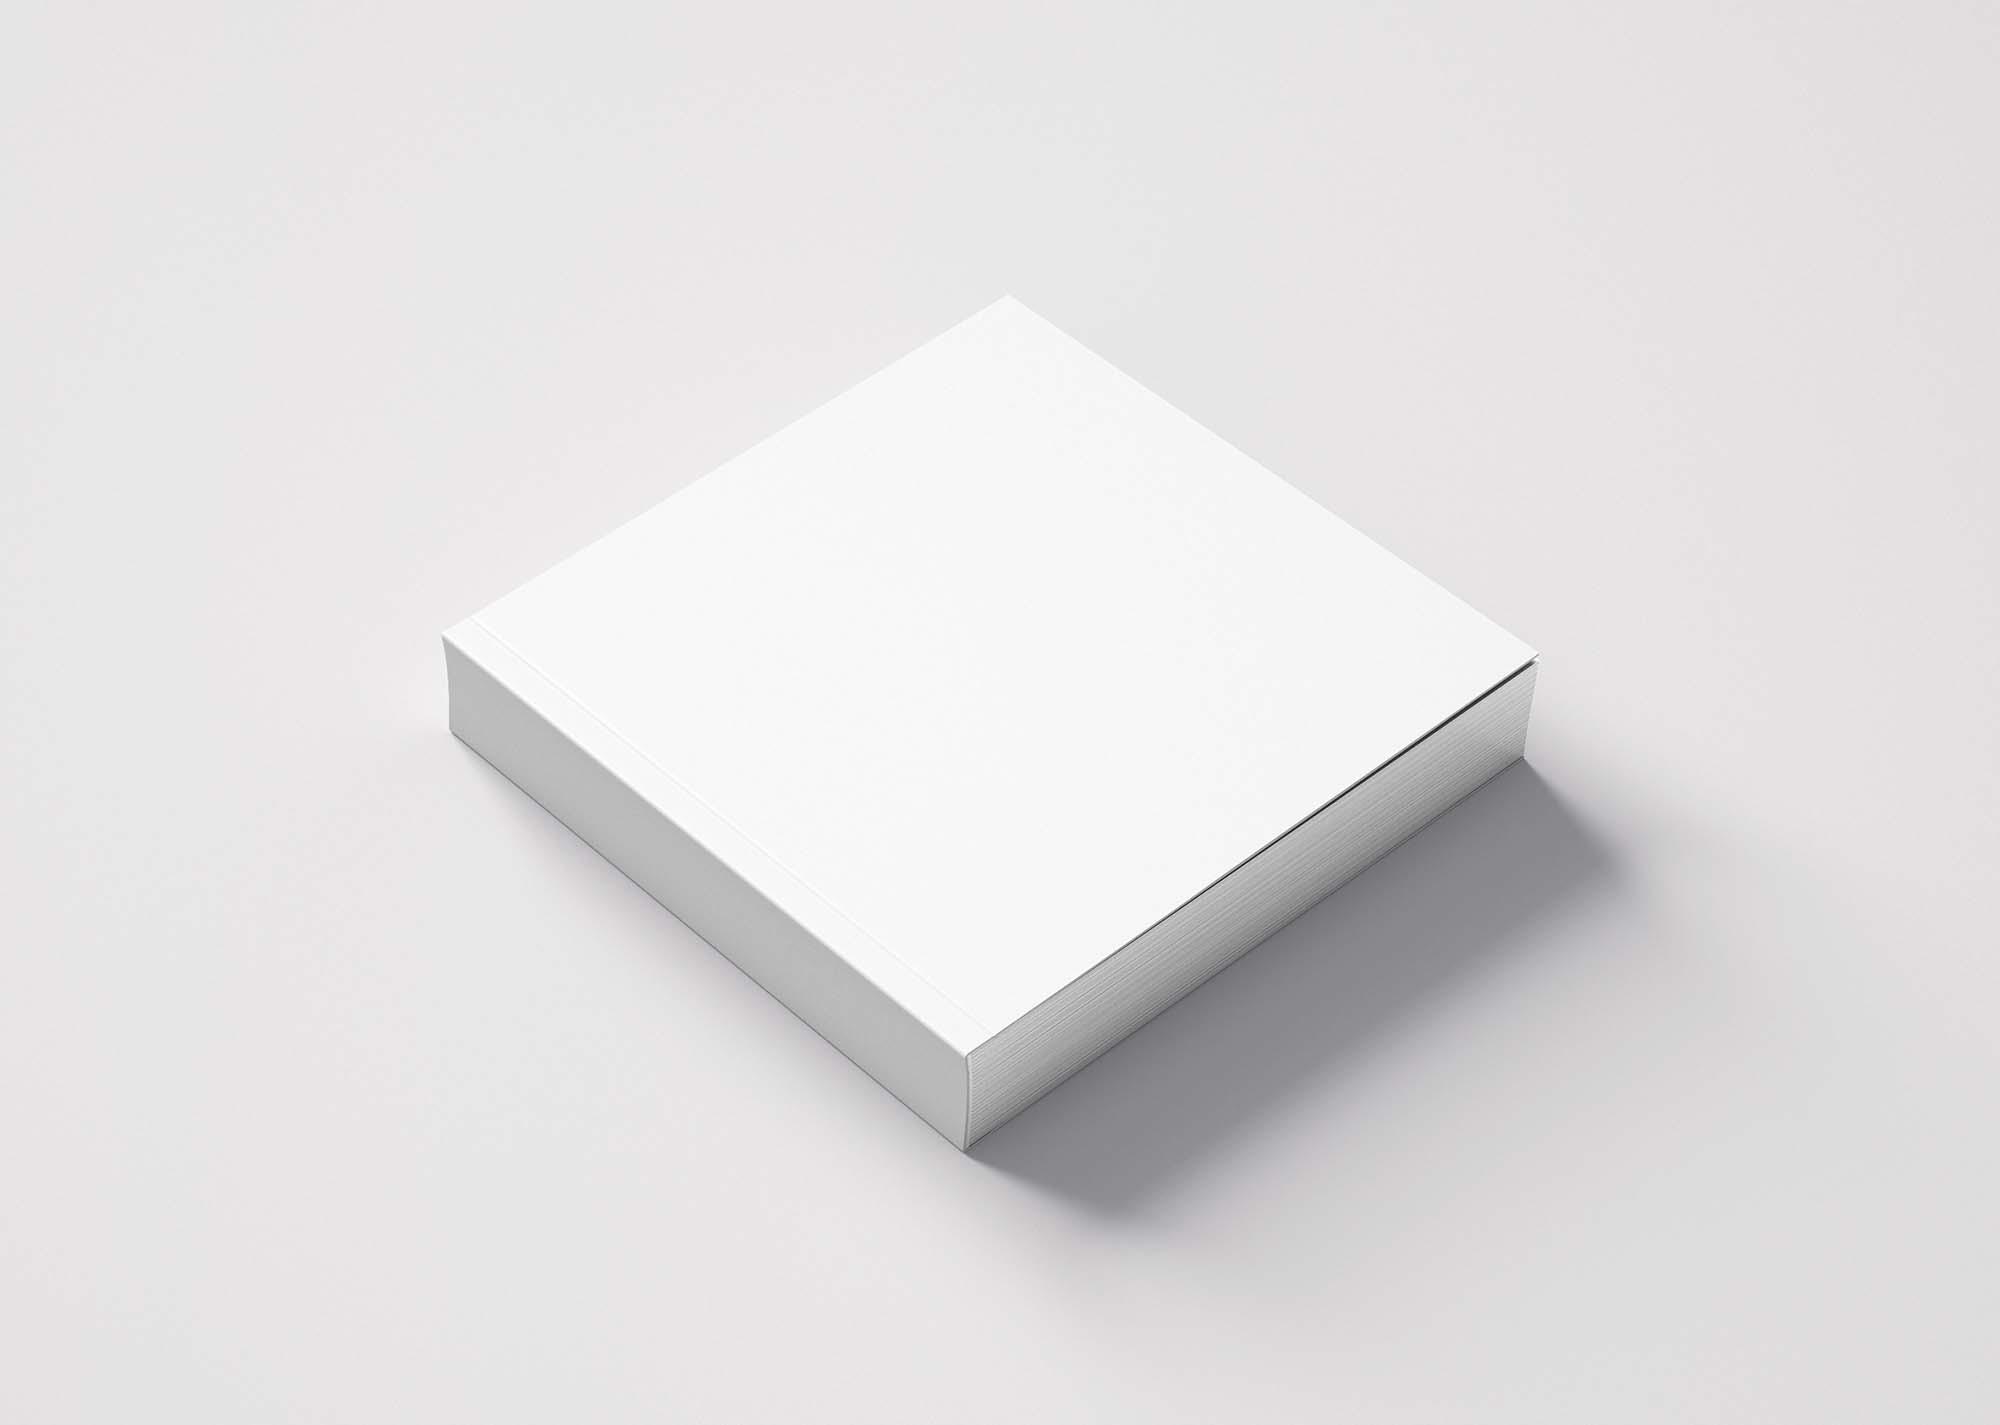 White Thin Small Box Mockup 2